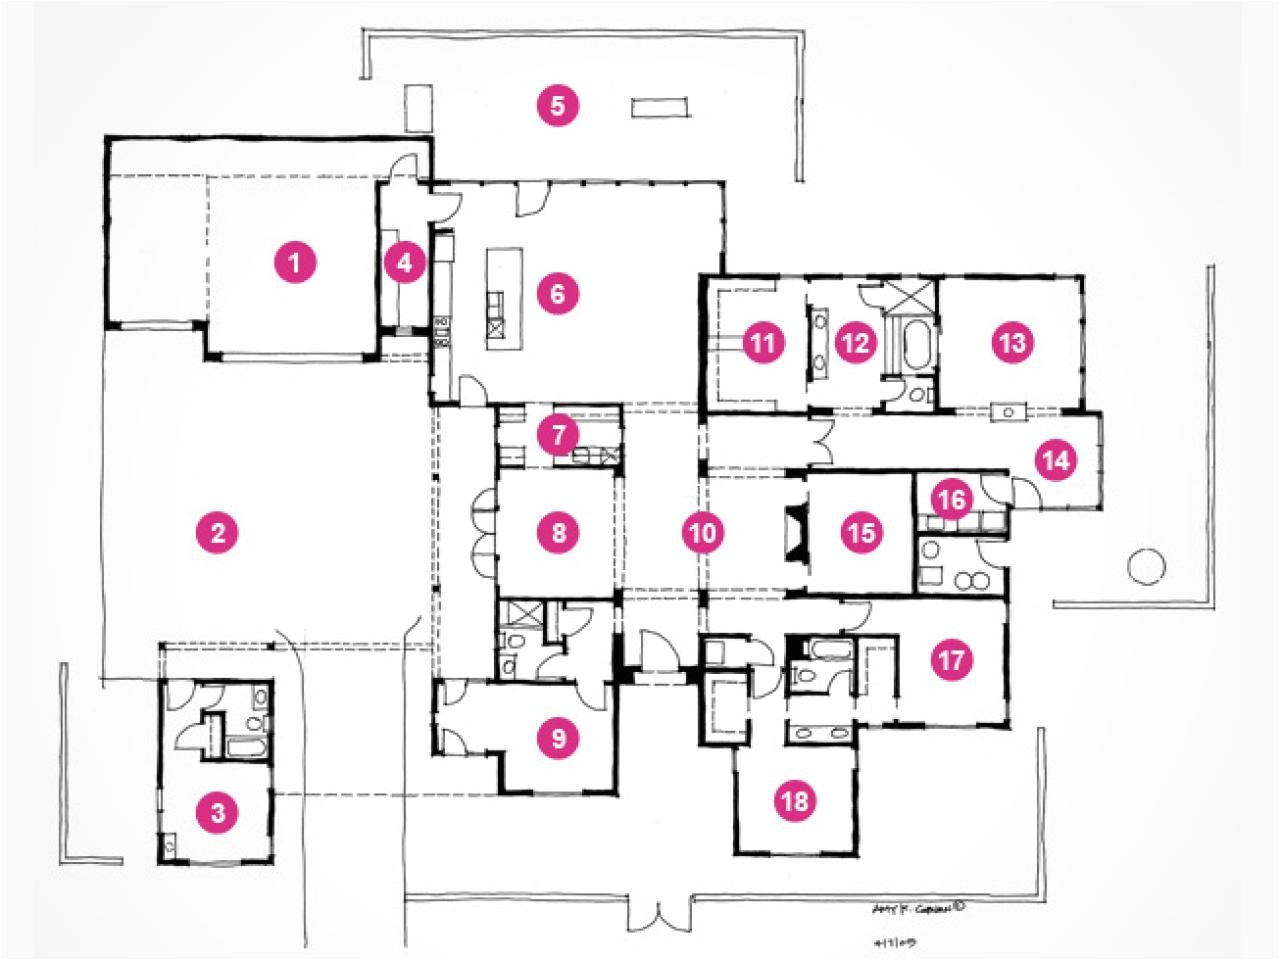 Dream Home12 Floor Plan Hgtv Dream Home 2010 Floor Plan and Rendering Pictures